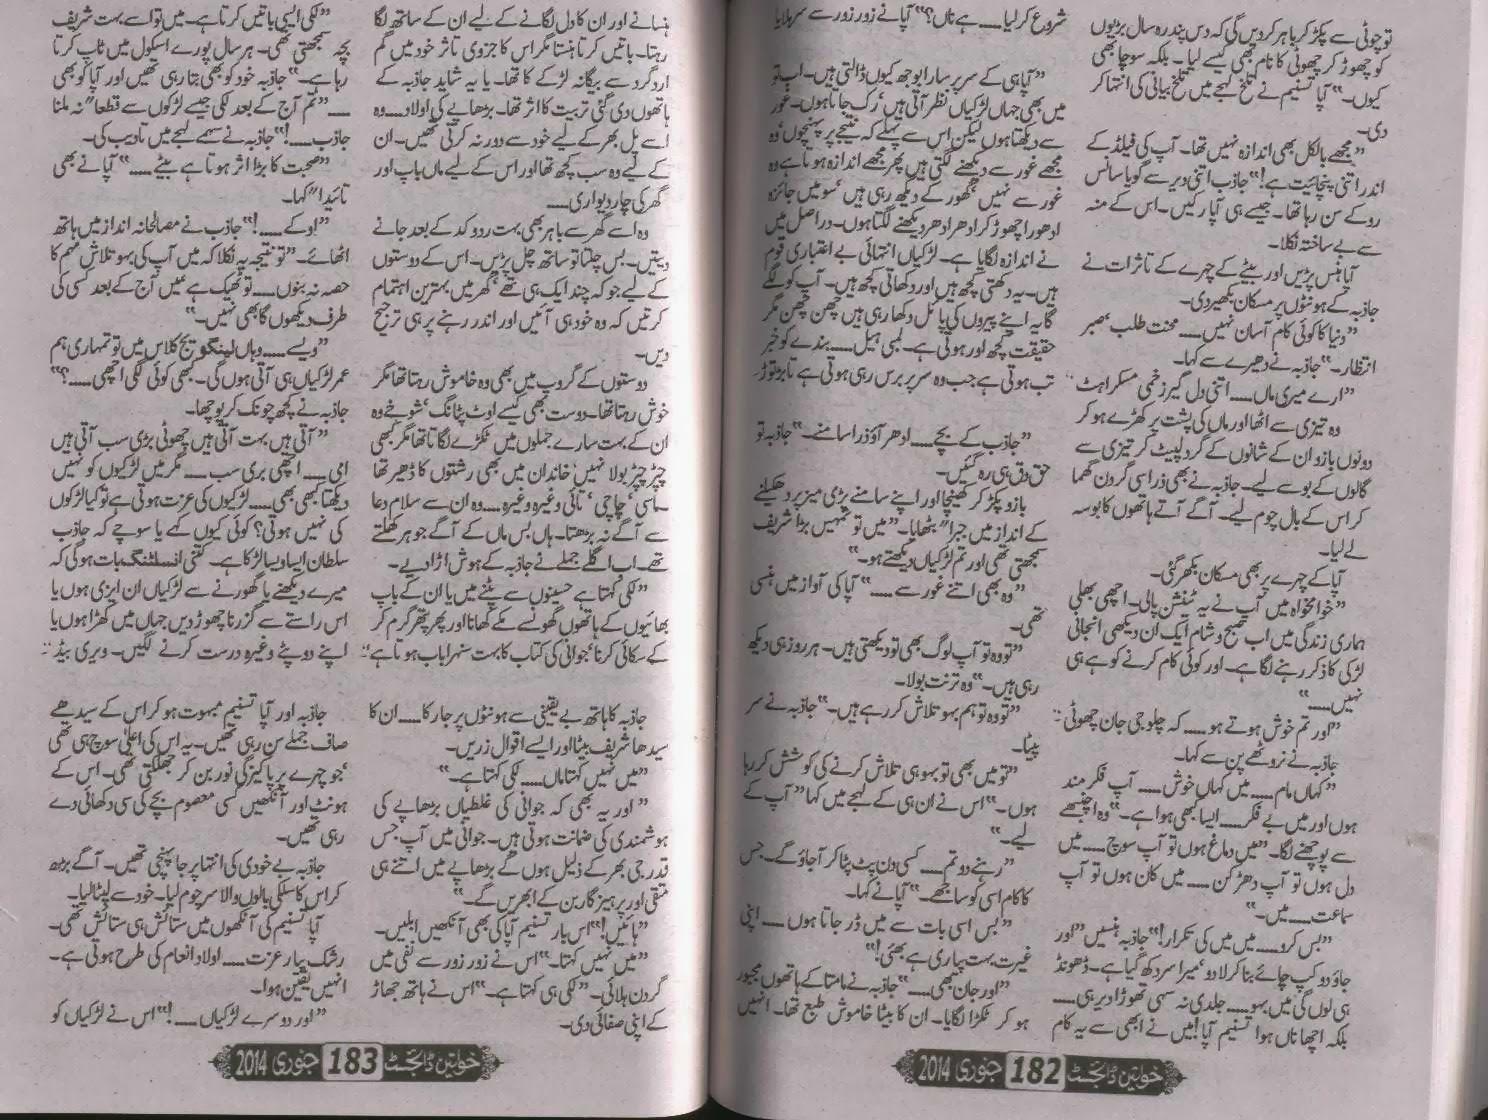 Ab kar meri rafu gari by saira raza pdf download